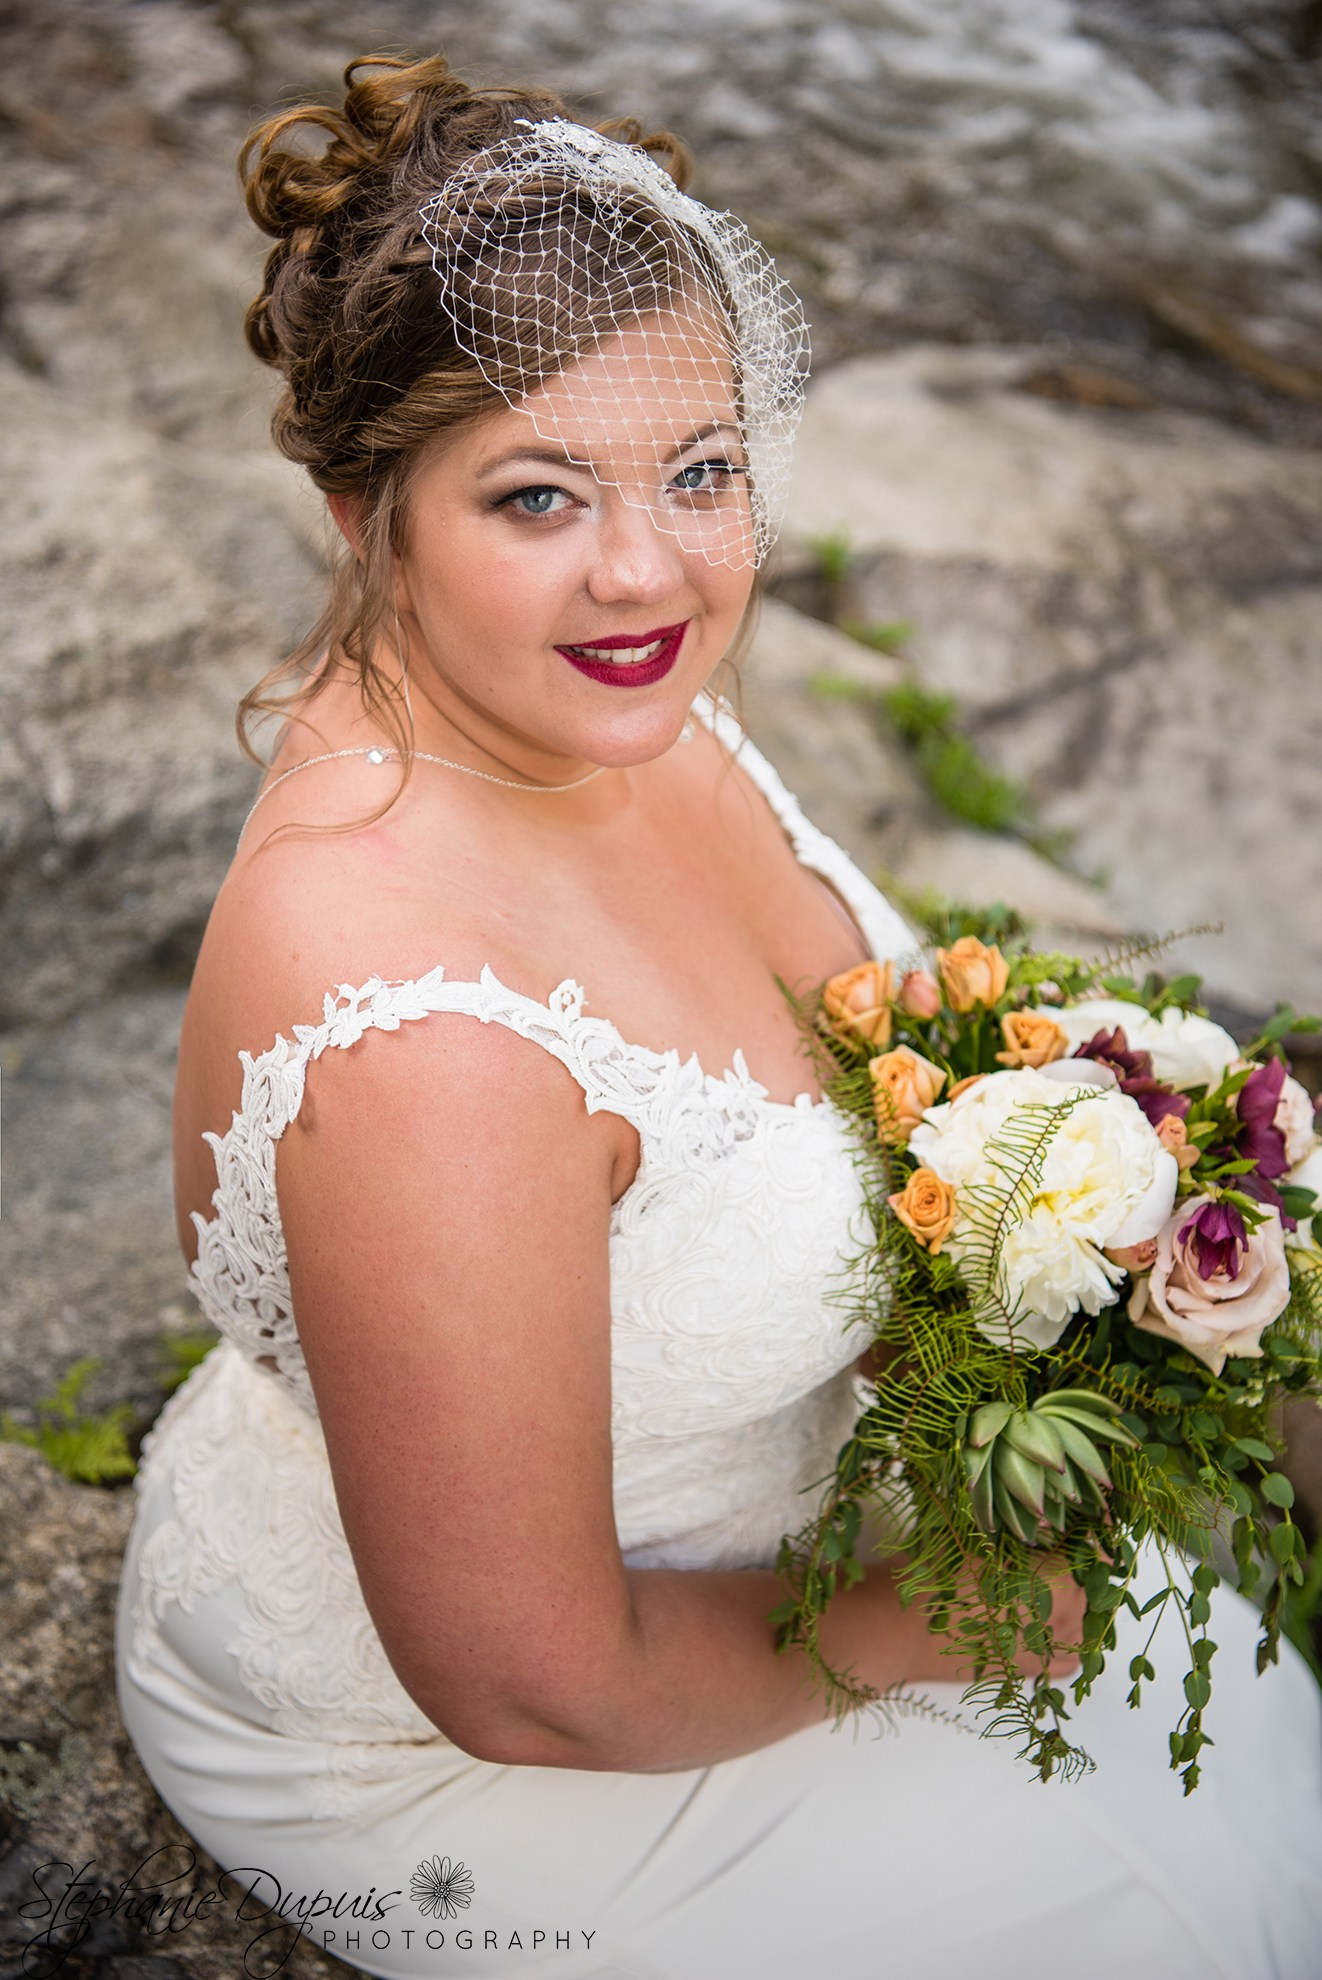 Pushee 13 - Portfolio: Pushee Wedding